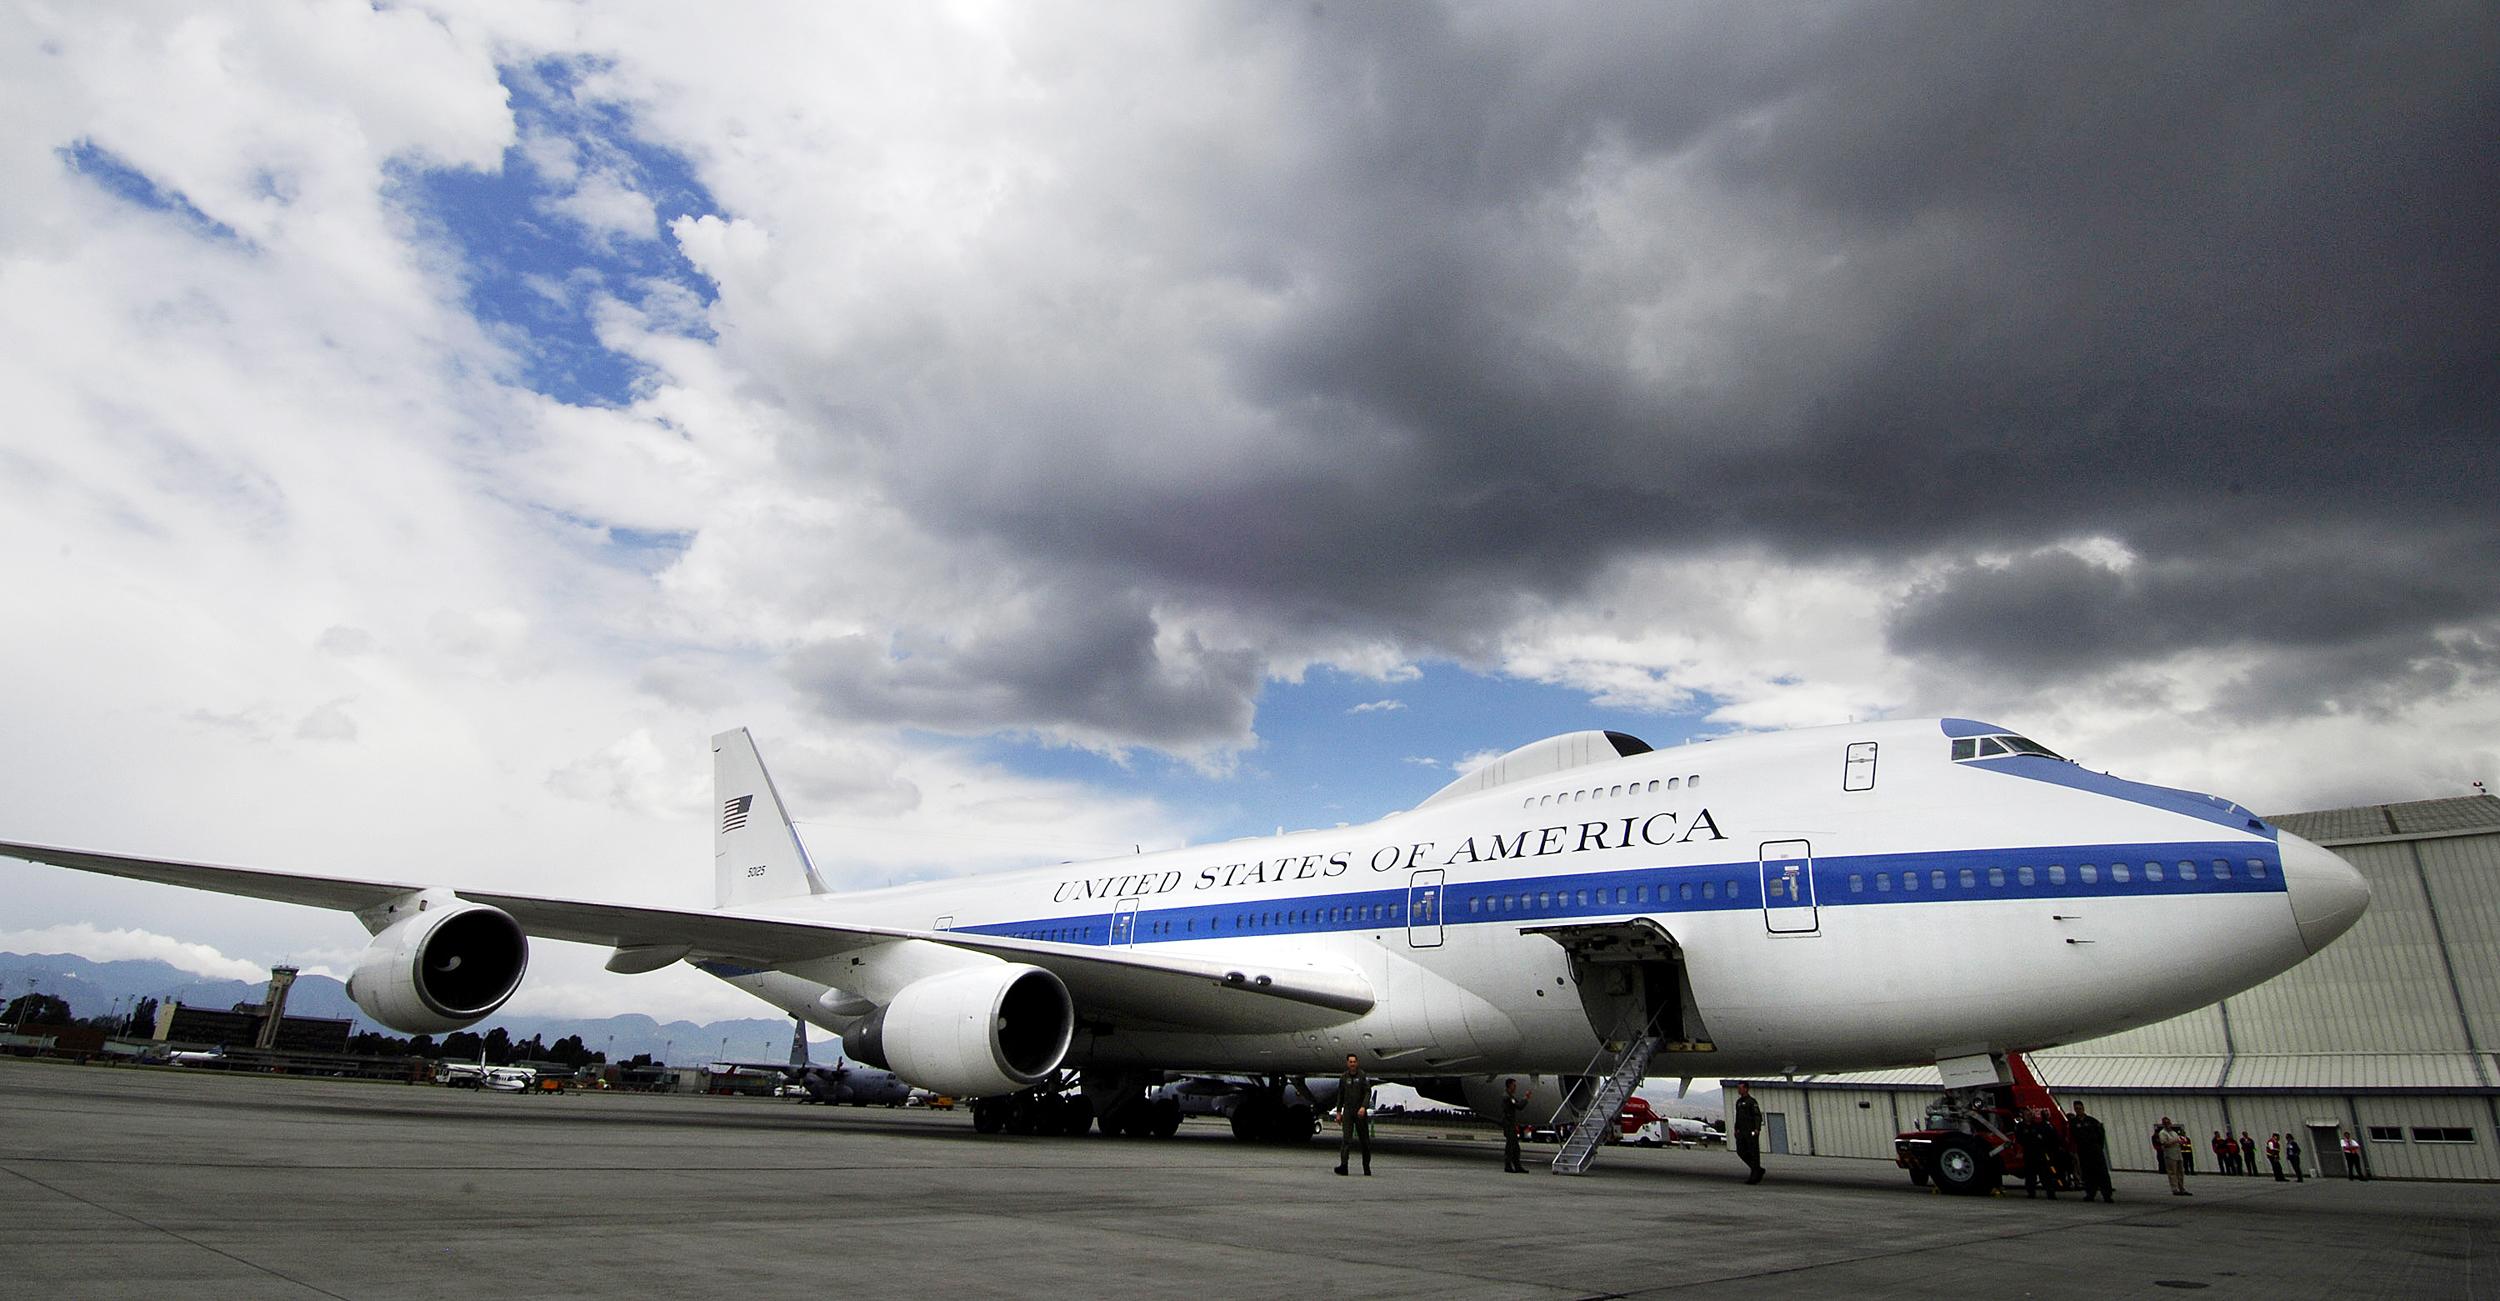 U S Military S Vital Doomsday Planes Damaged In Tornado